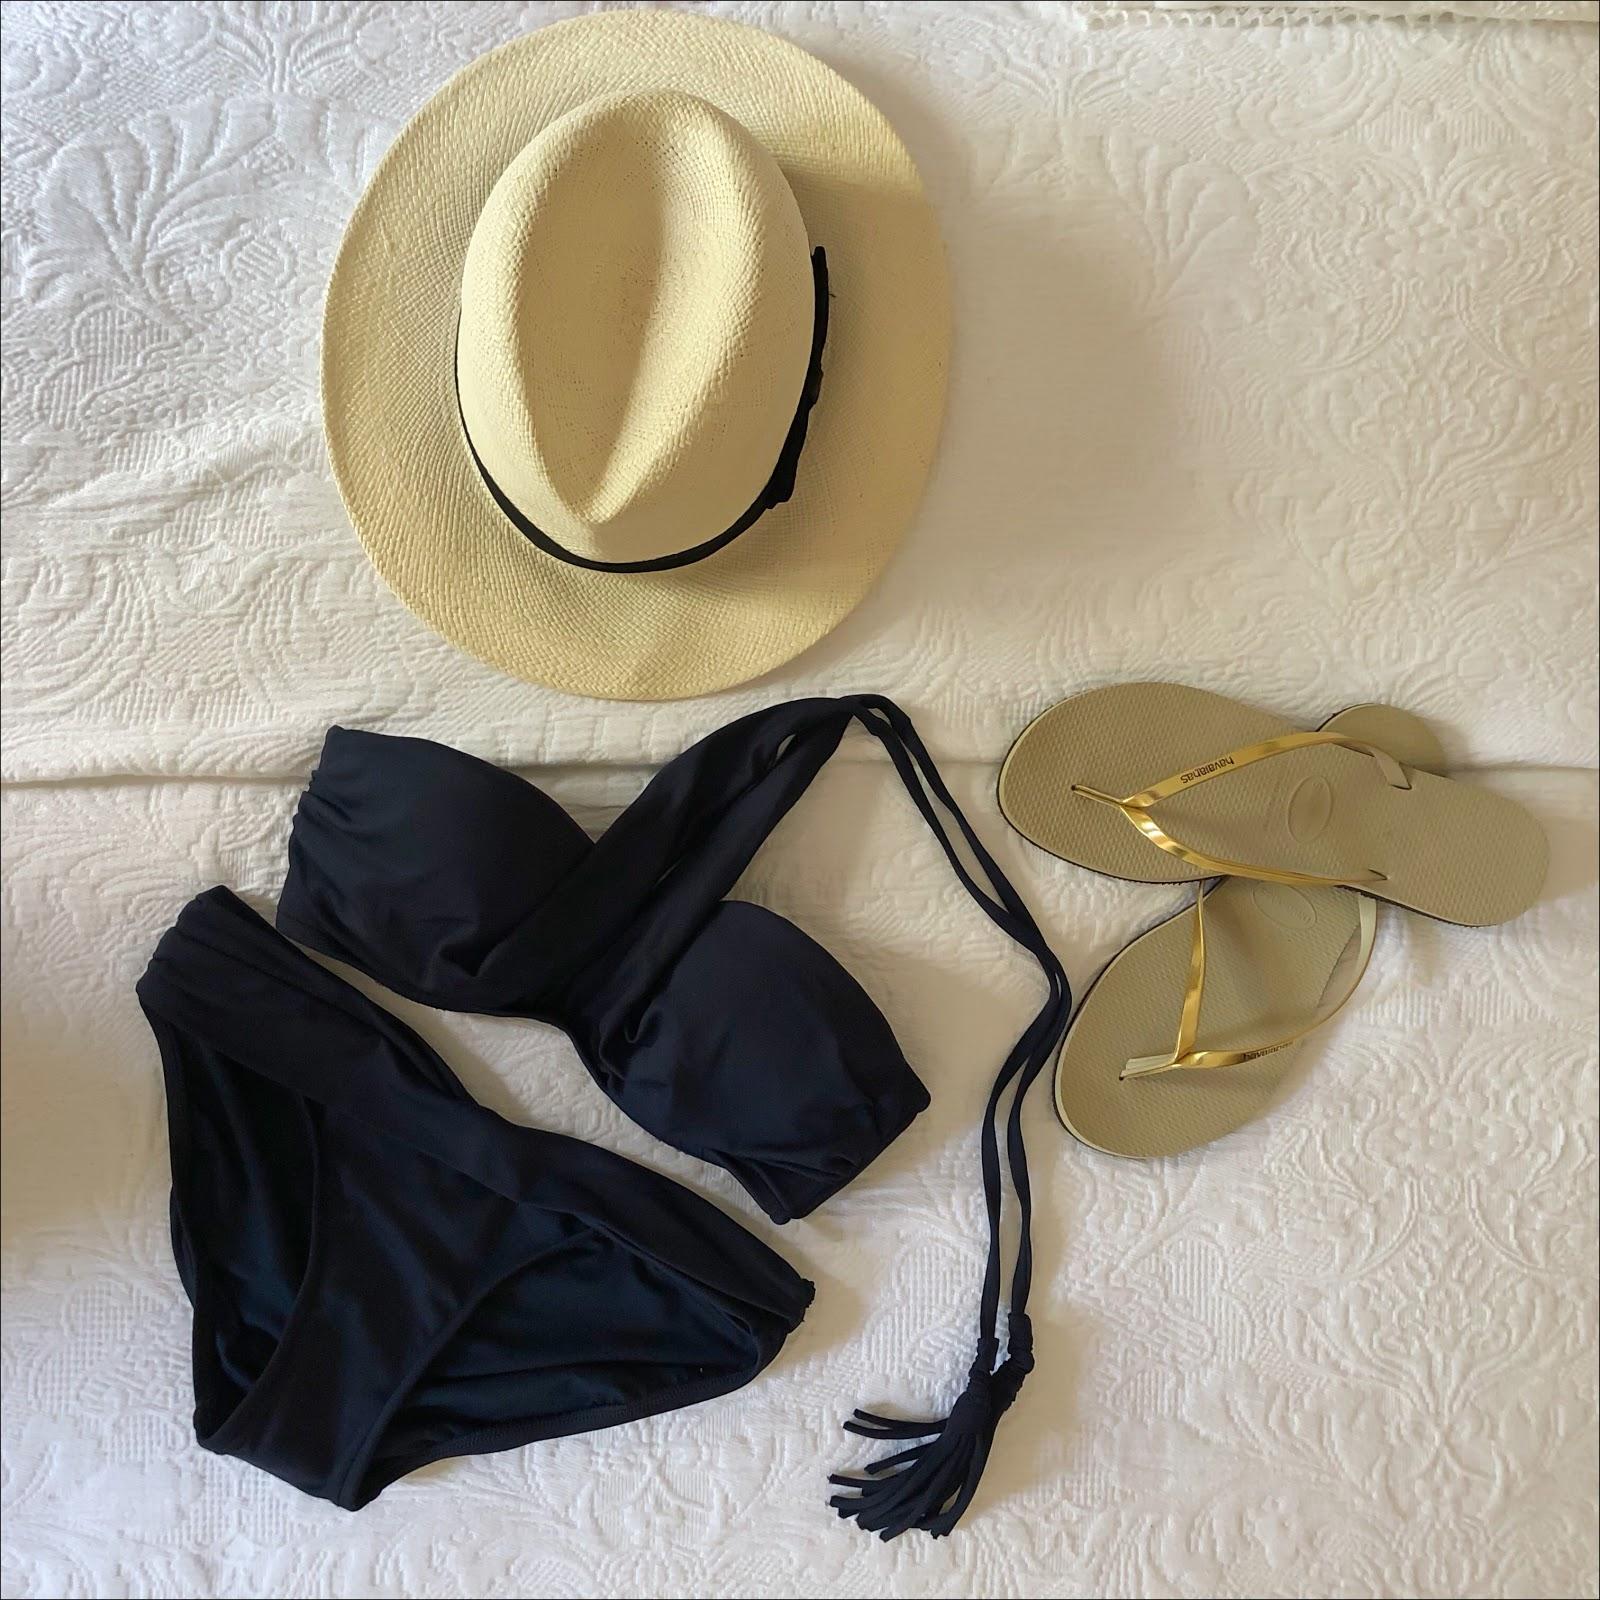 my midlife fashion, coco bay, marks and spencer handwoven panama hat, seafolly indigo wrap front bandeau bikini top, seafolly indigio twist band pant, havaianas light gold you metallic flip flops